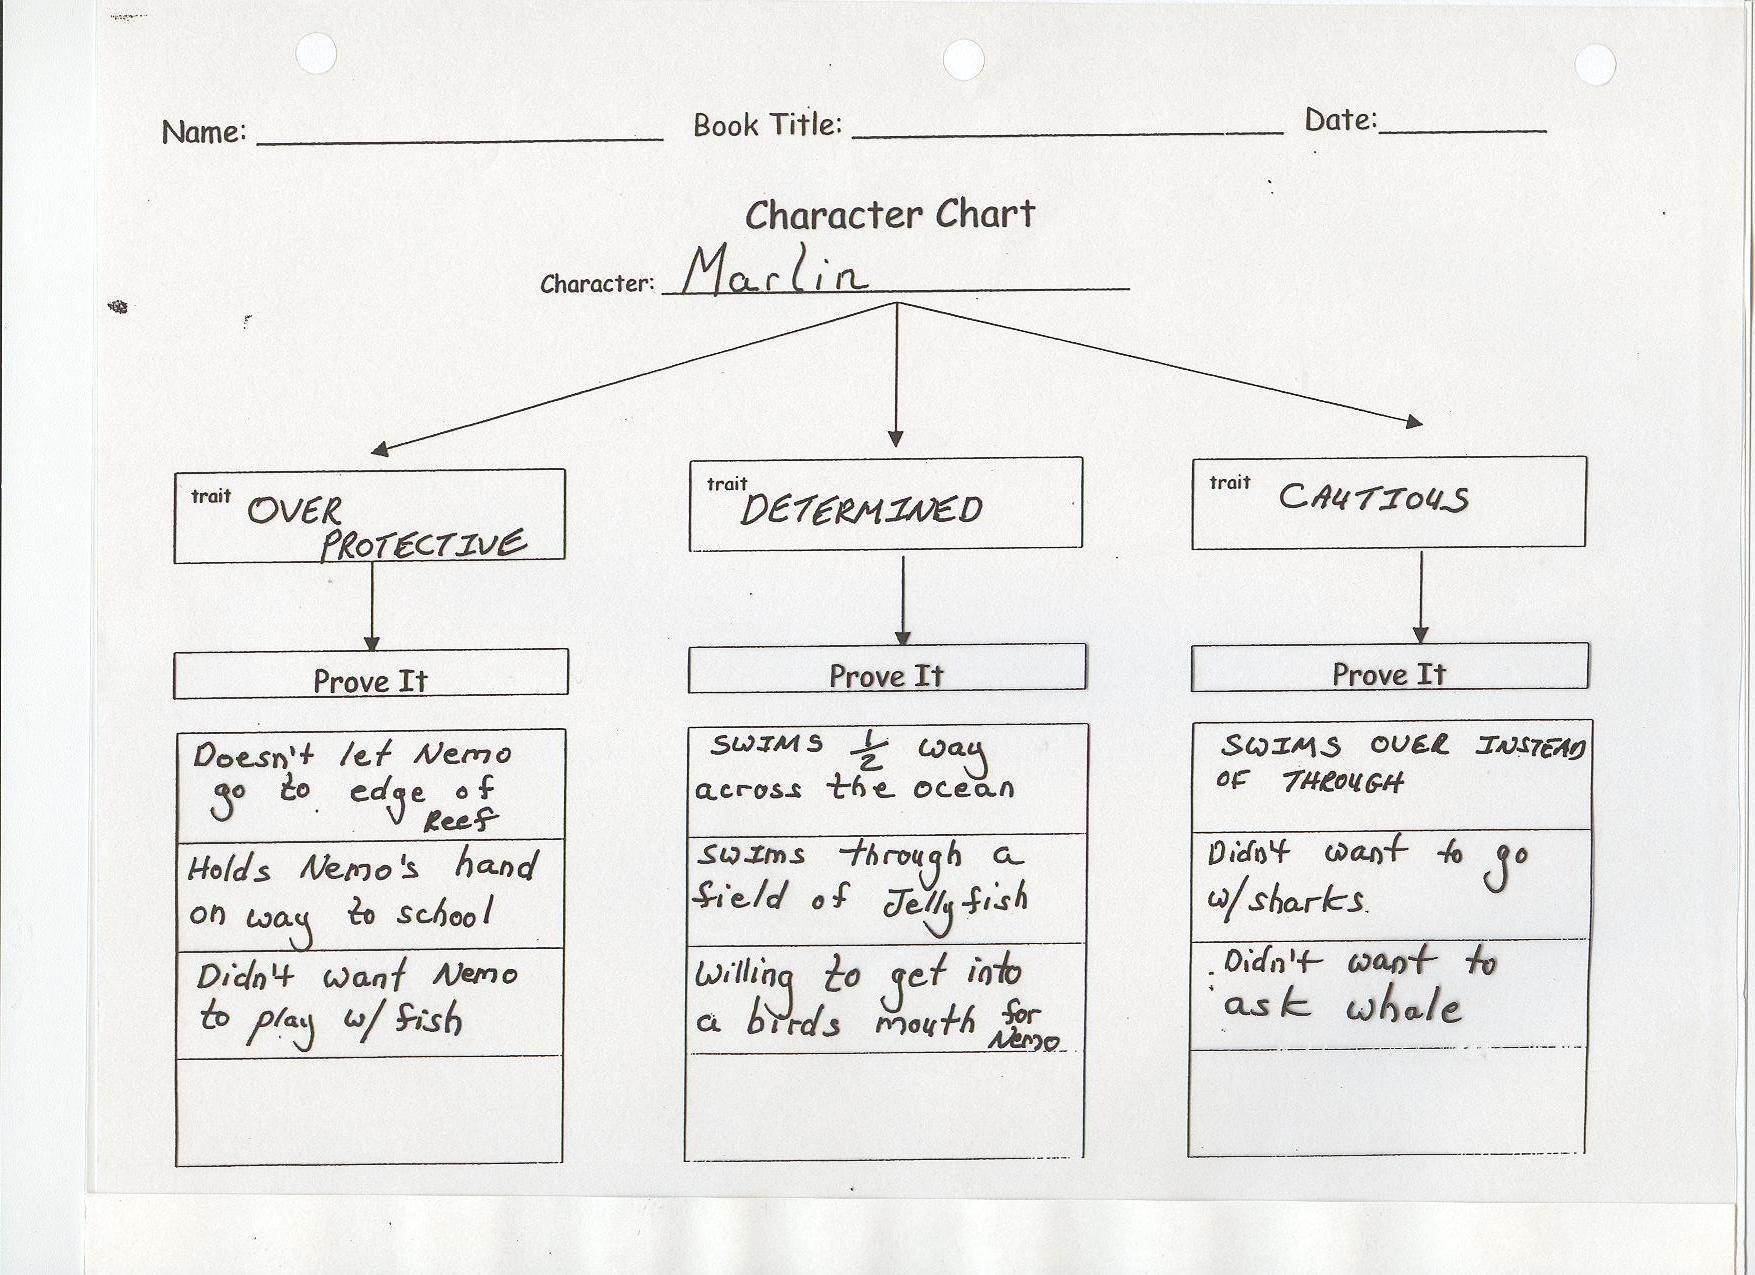 Character Development, Traits Grades 3-5